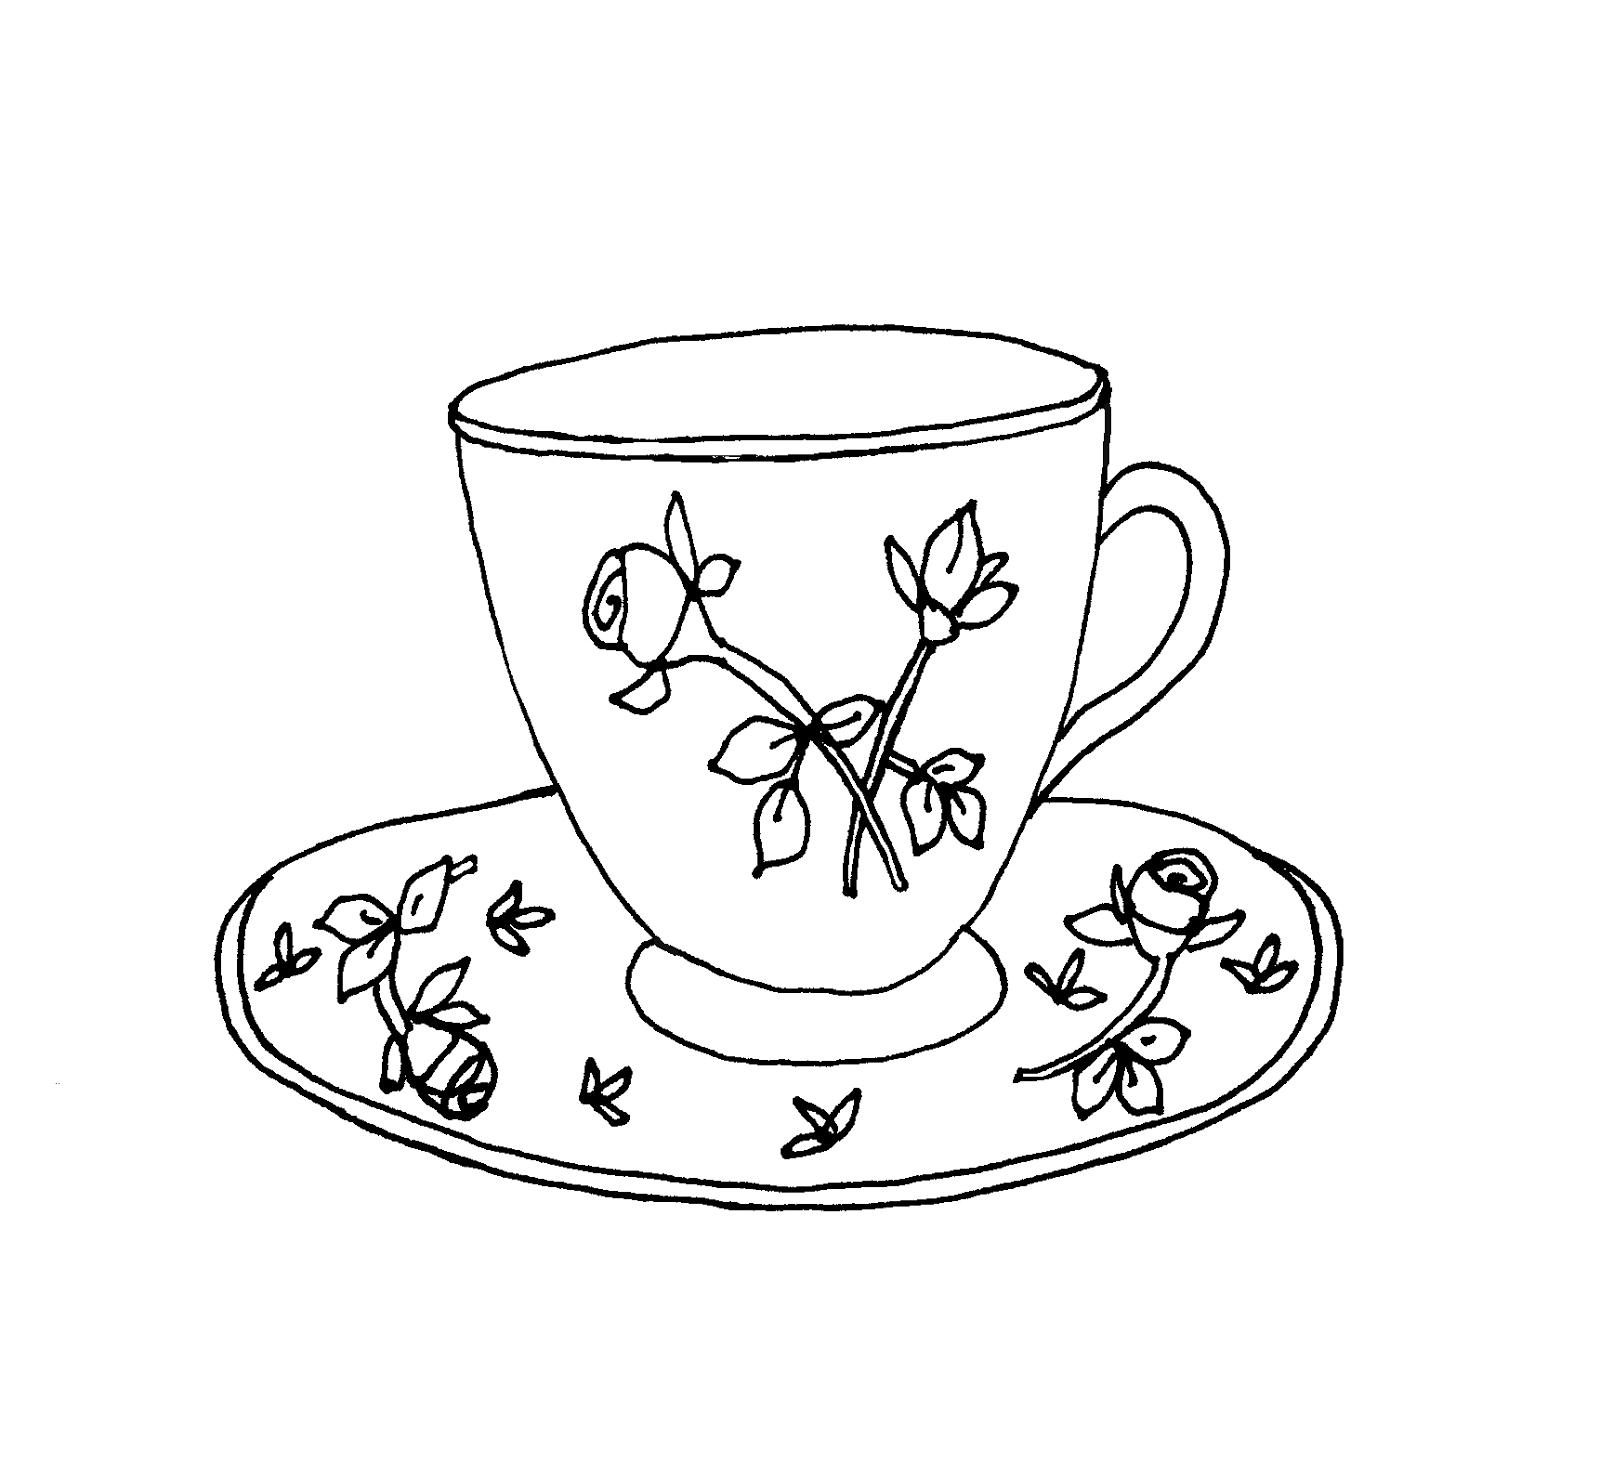 1600x1477 55 Tea Cup Sketch, Tea Set Sketch Royalty Free Stock Photos Image